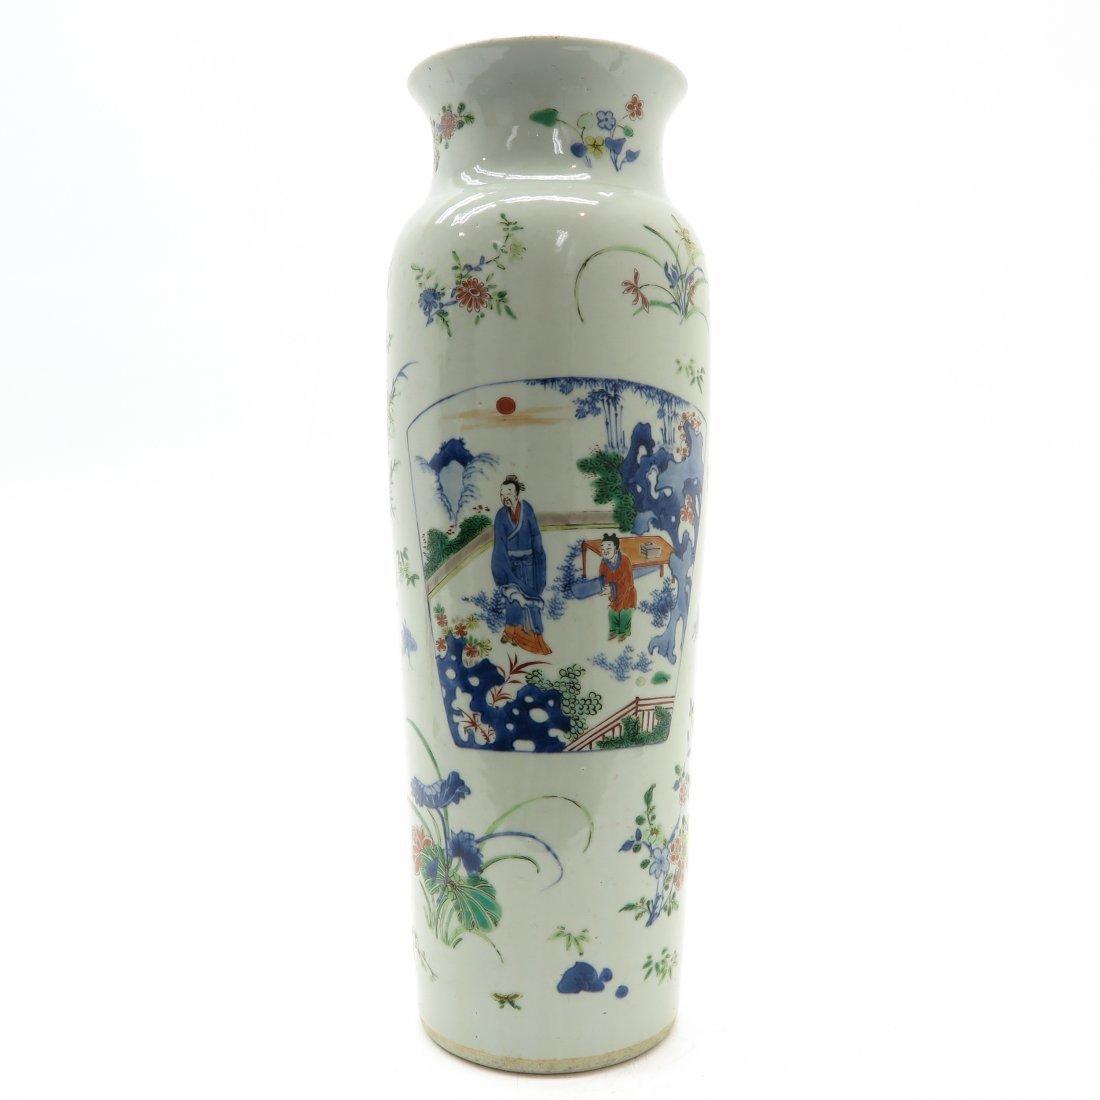 China Porcelan Famille Verte Decor Vase